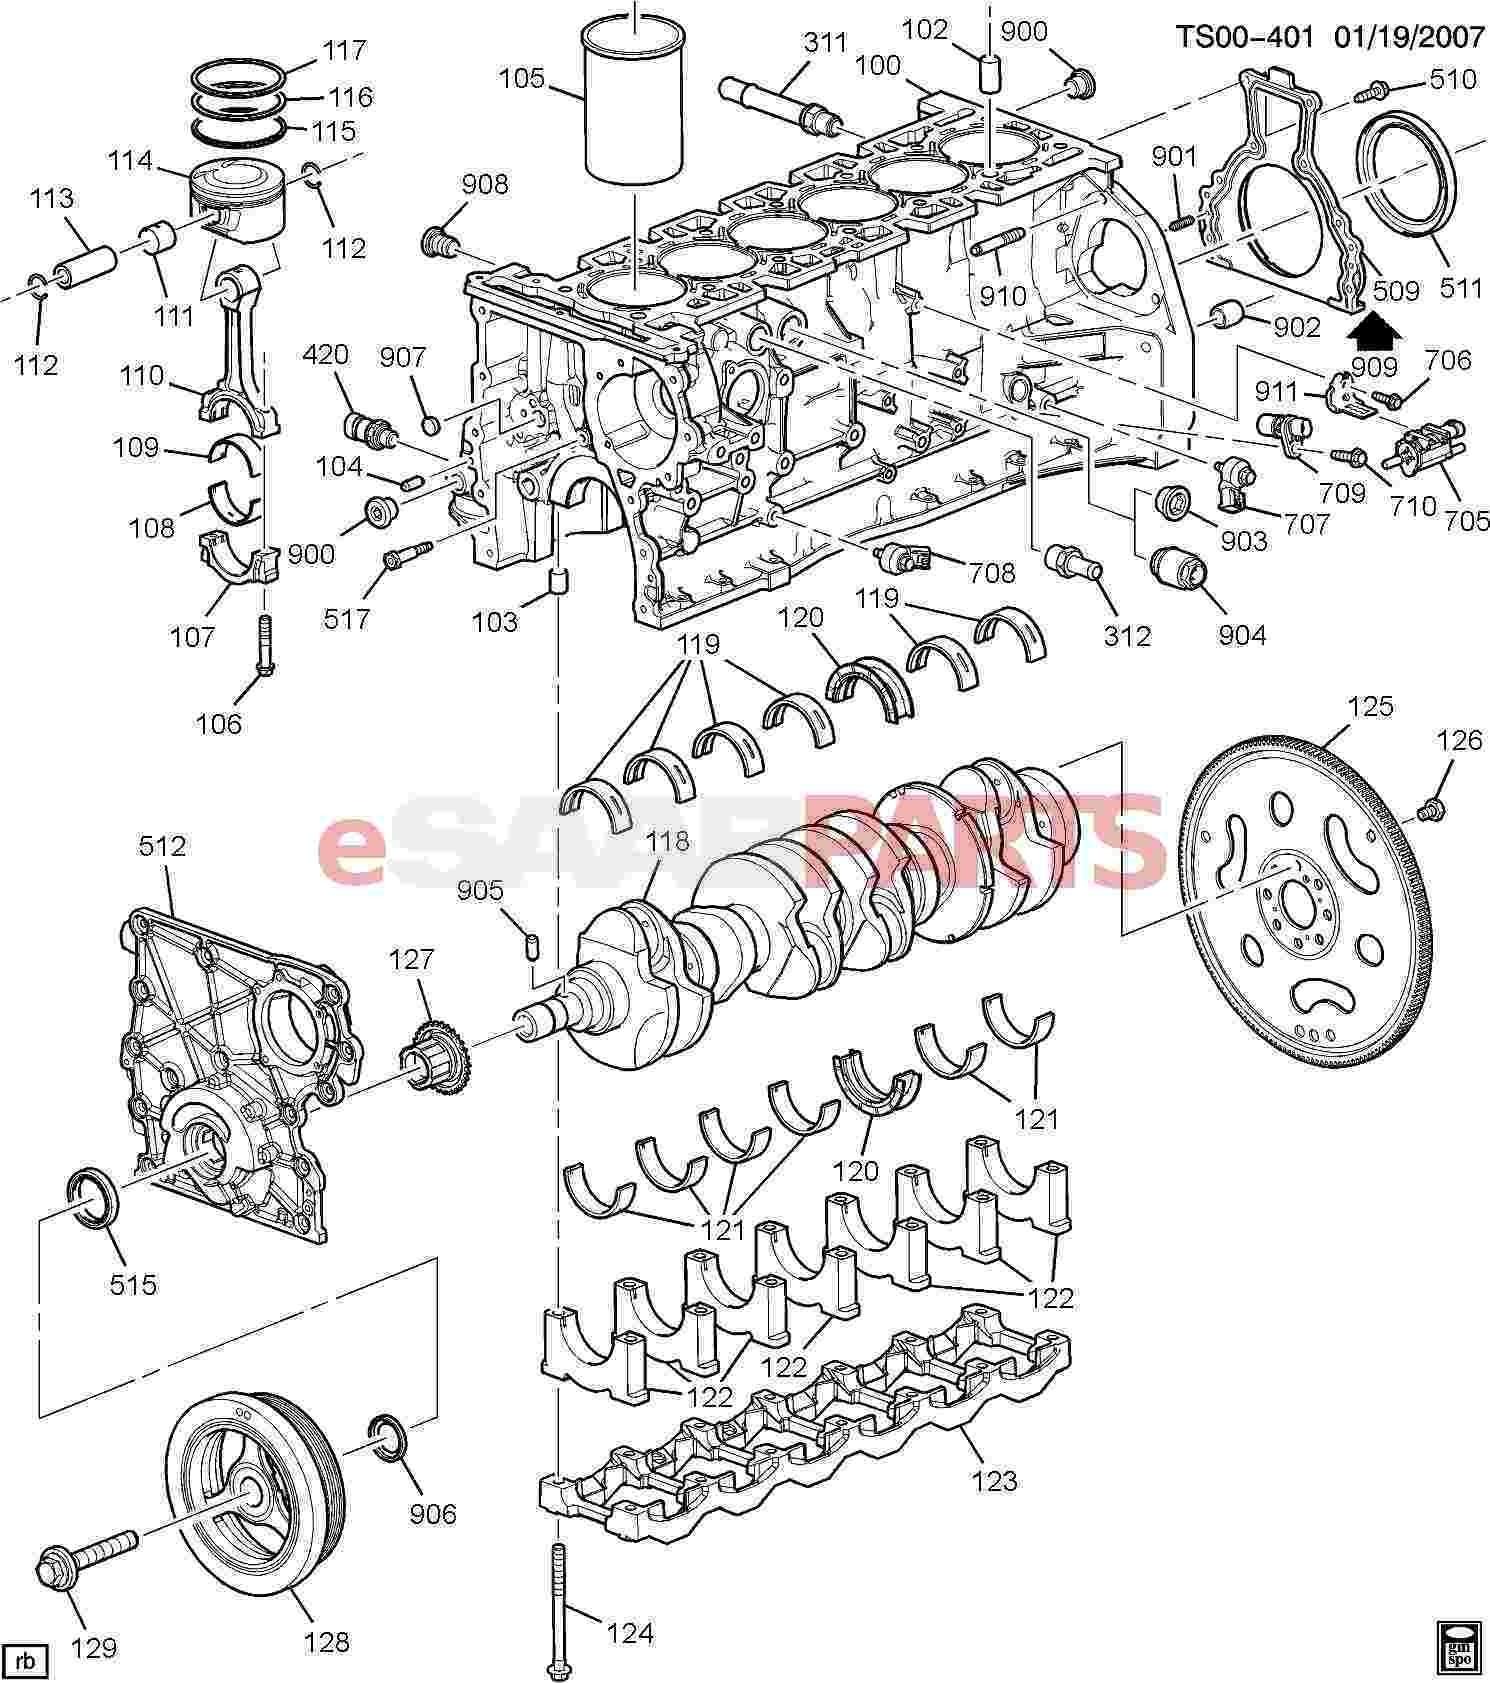 Engine Parts Diagram Names ] Saab Plug M16x1 5×14 24 Od society Automotive Of Engine Parts Diagram Names